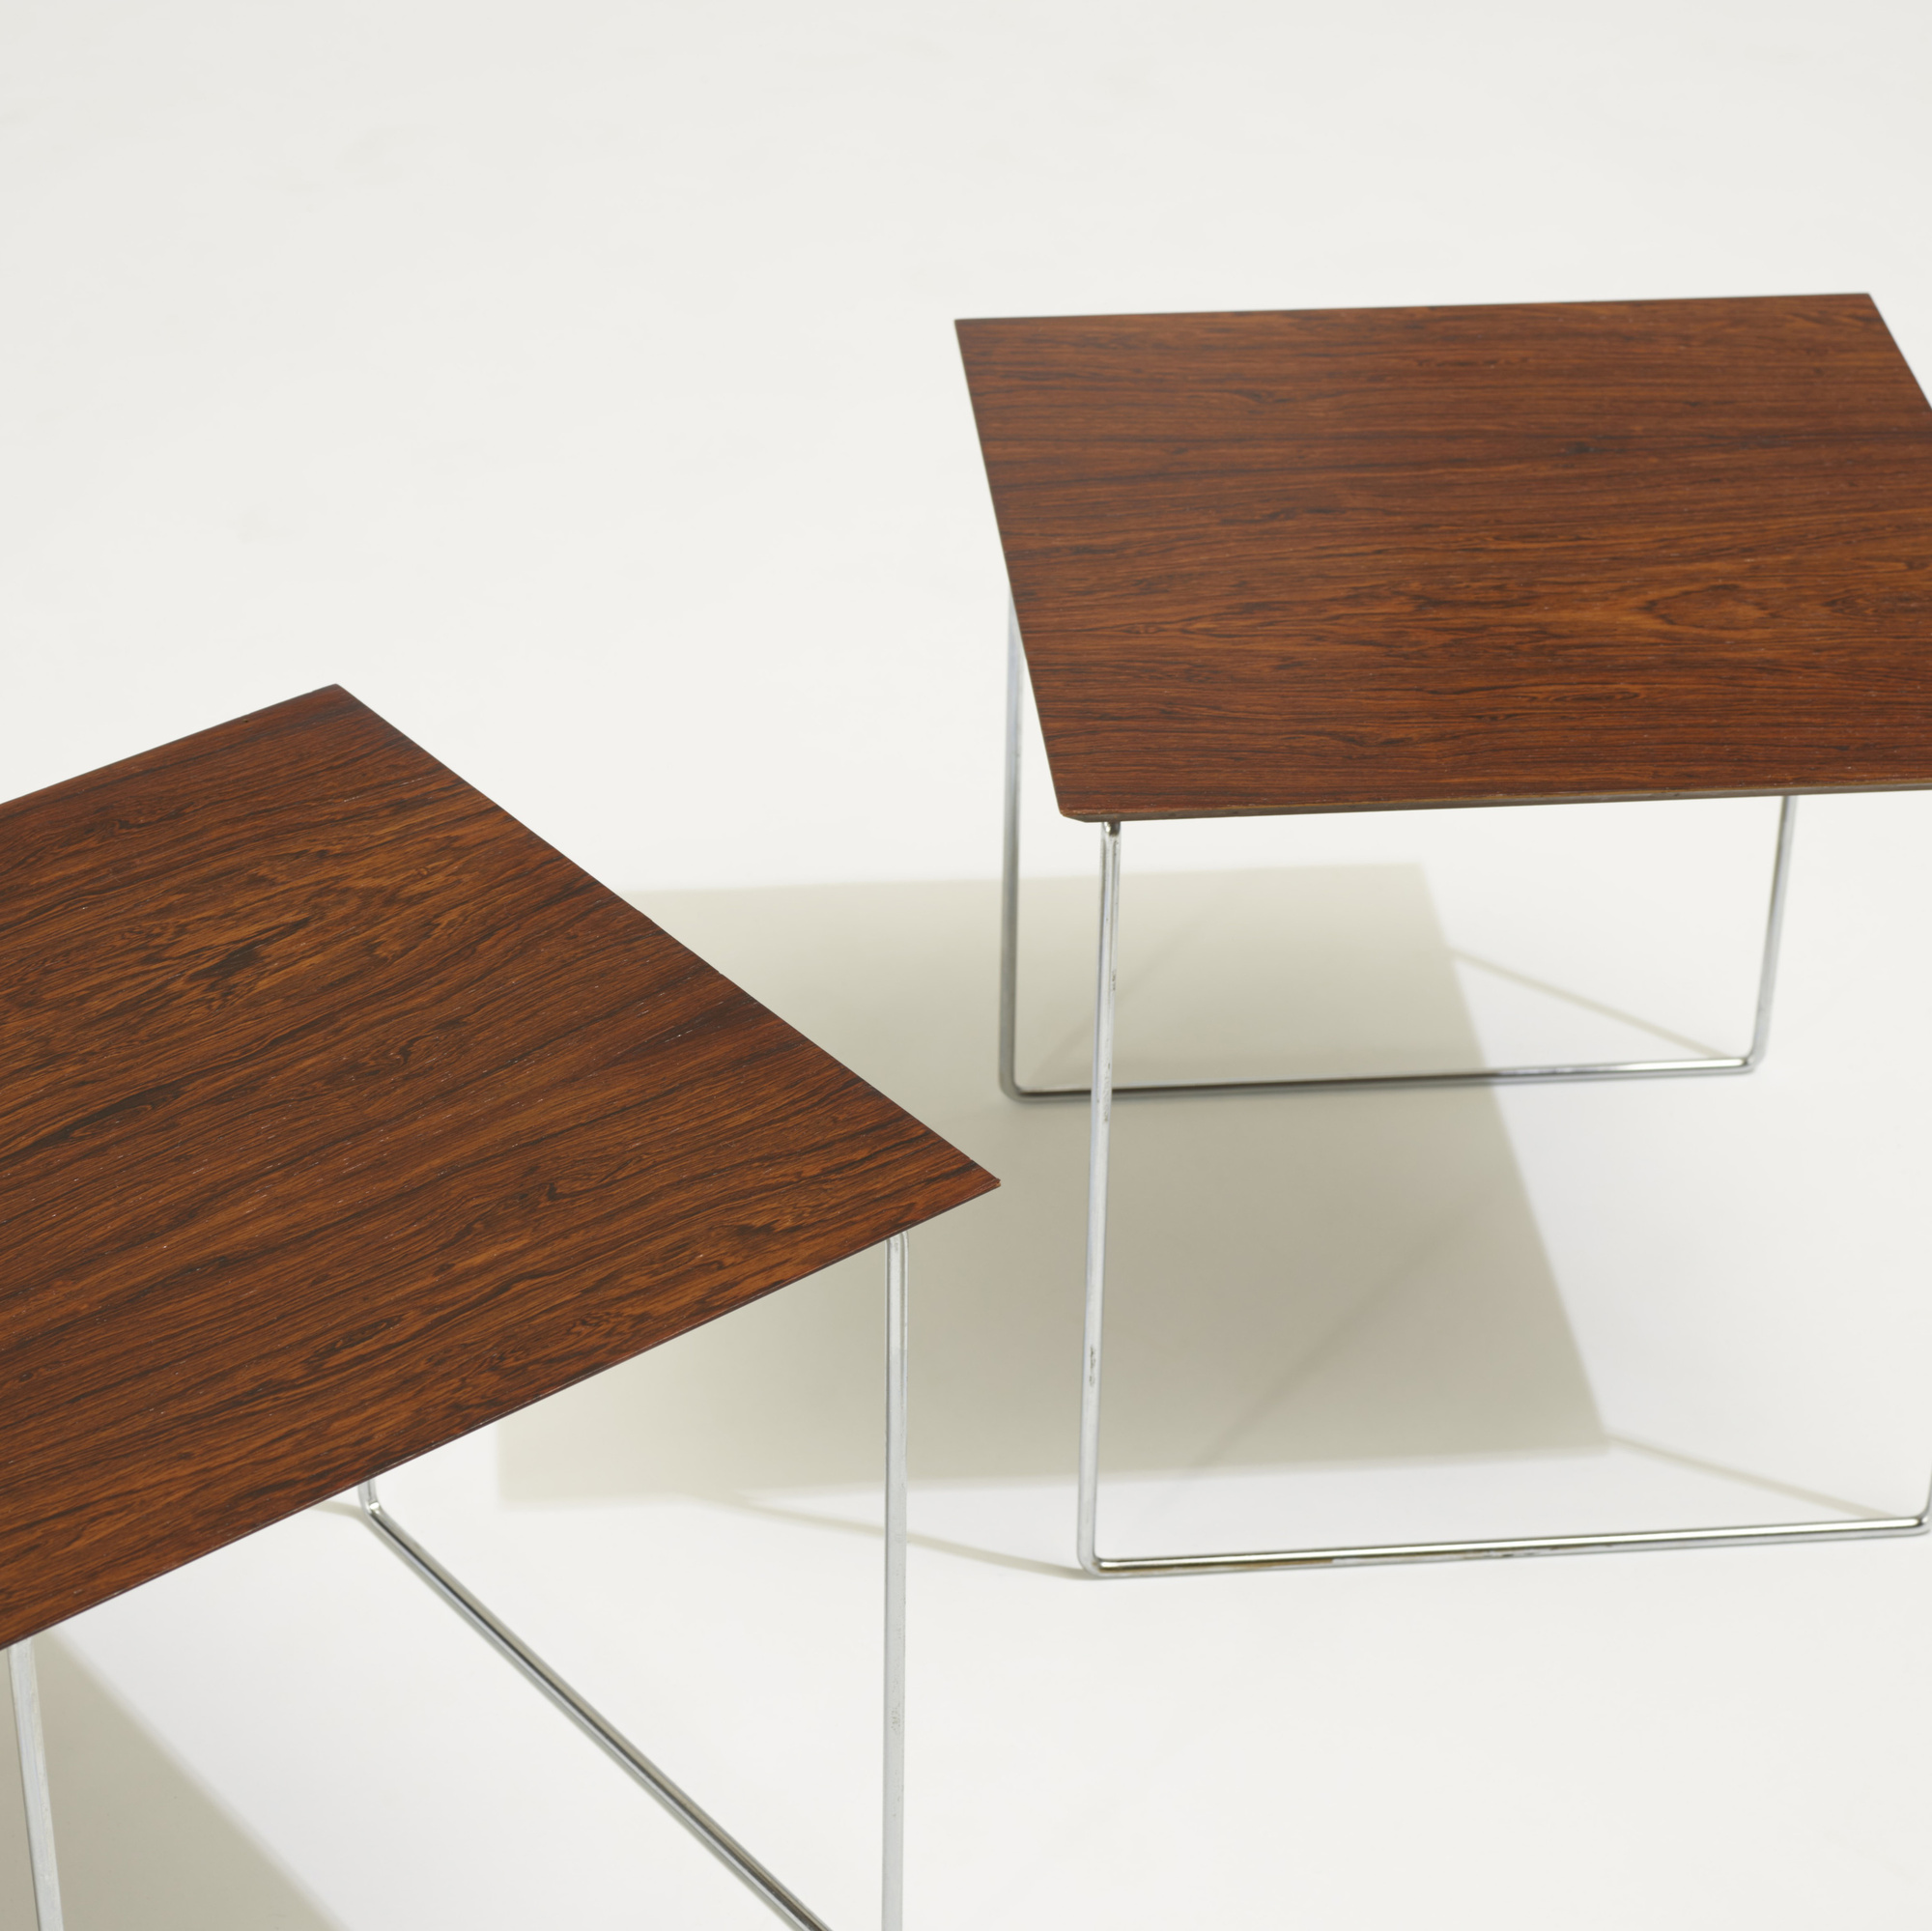 147: Poul Nørreklit / cube nesting tables, set of six (4 of 5)